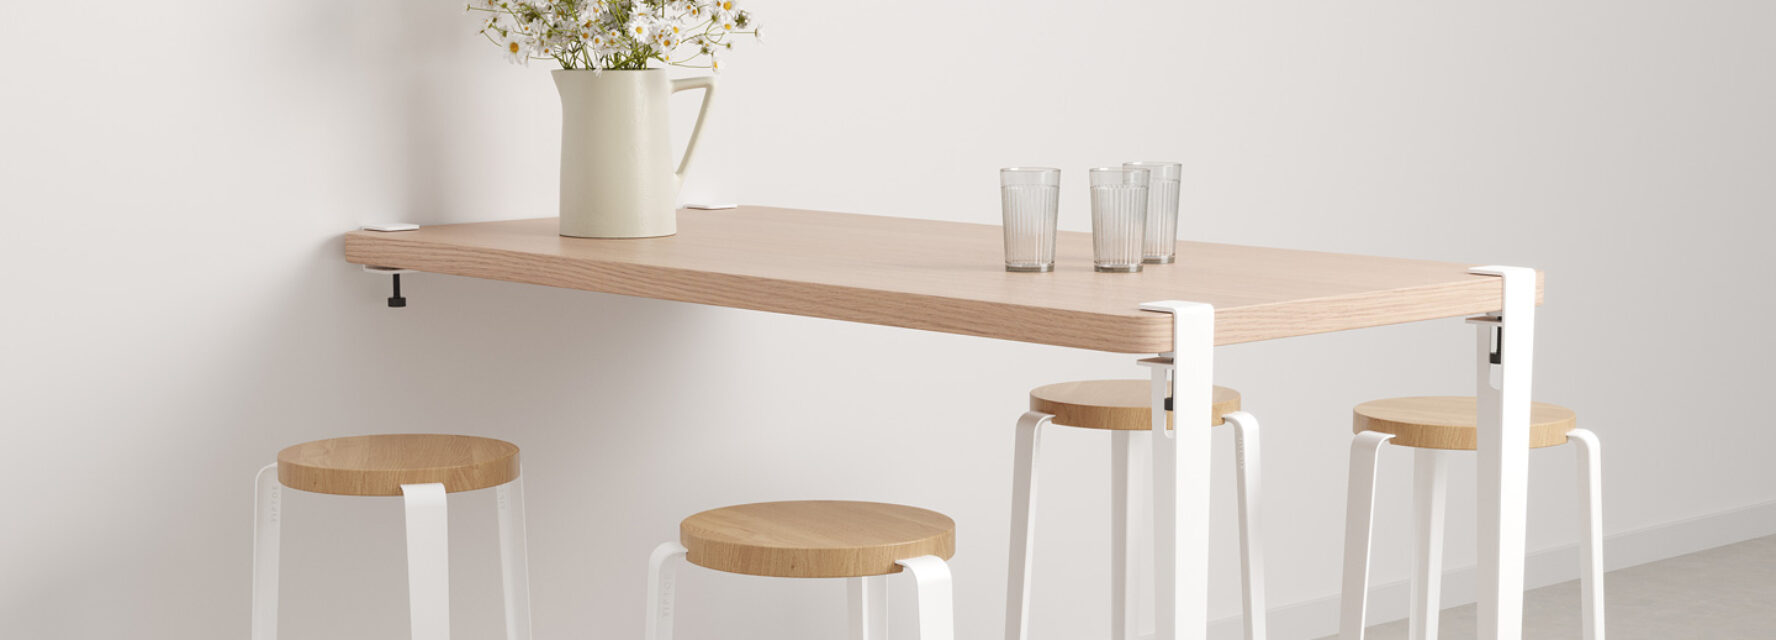 High tables - TIPTOE